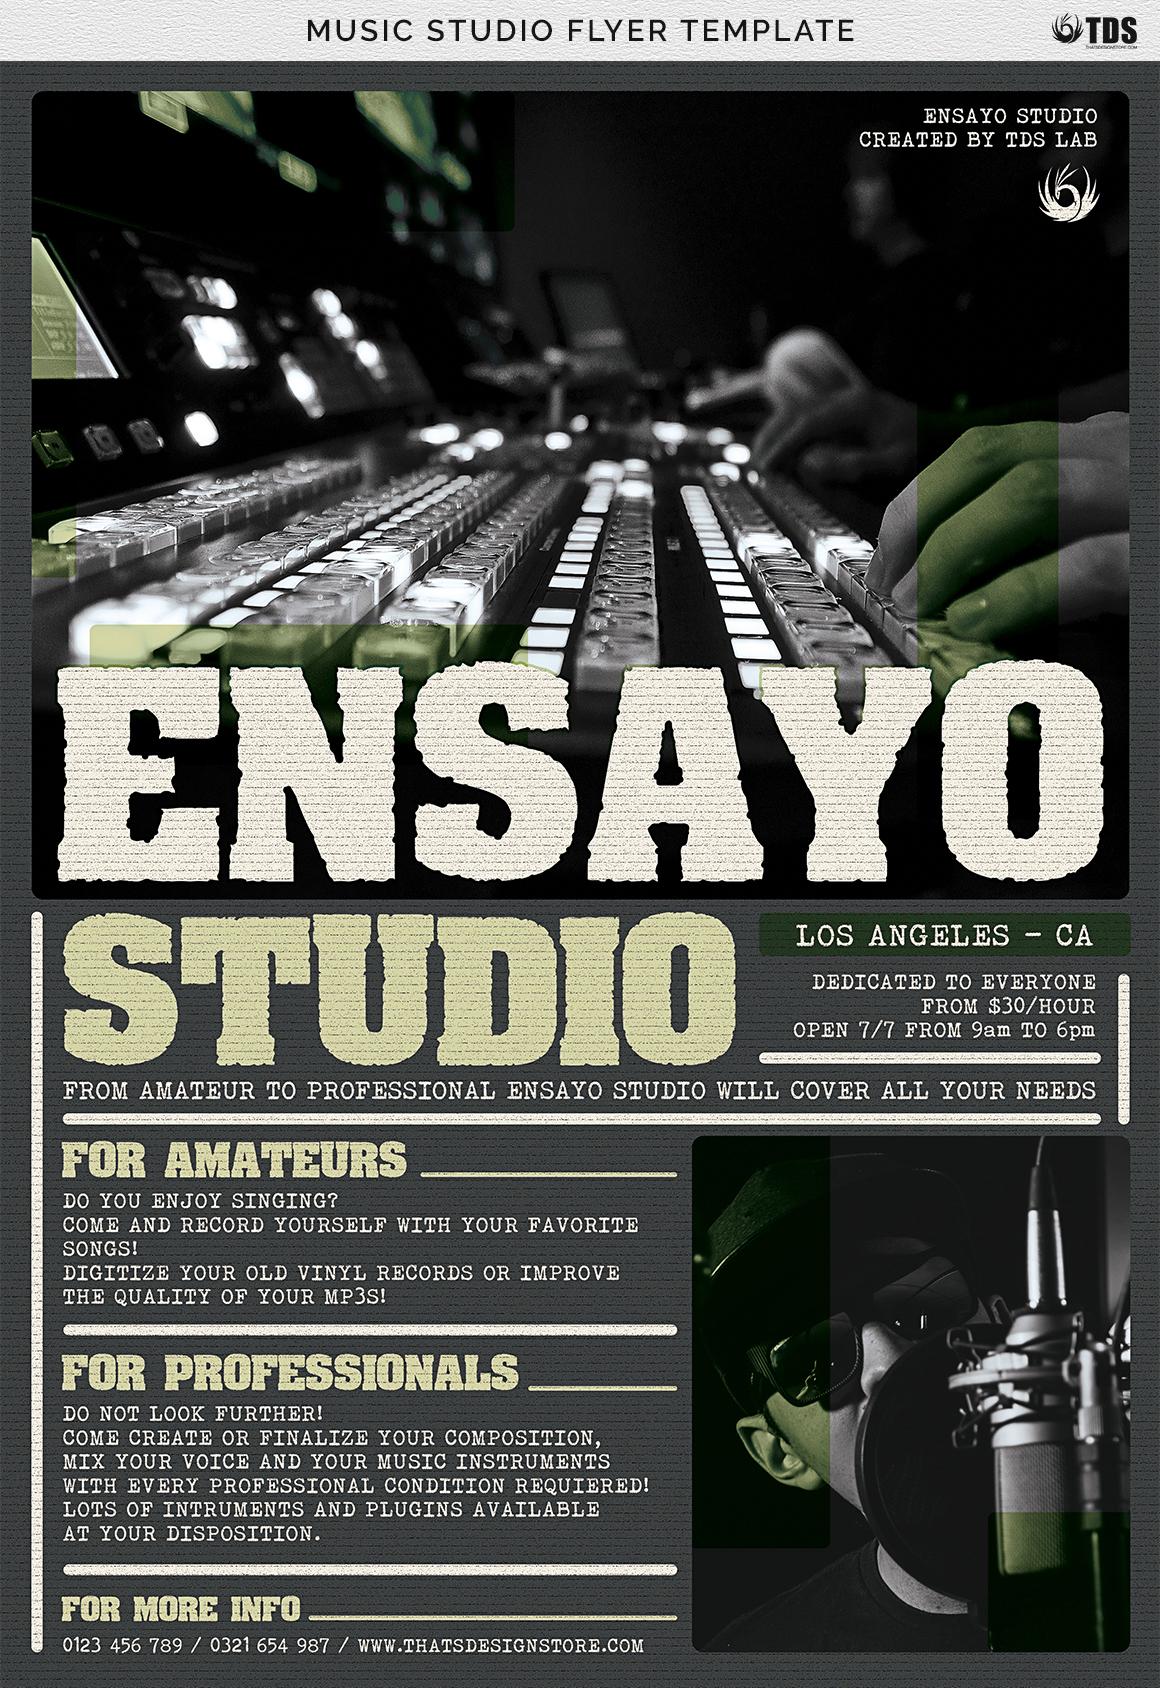 Music Studio Flyer Template example image 8